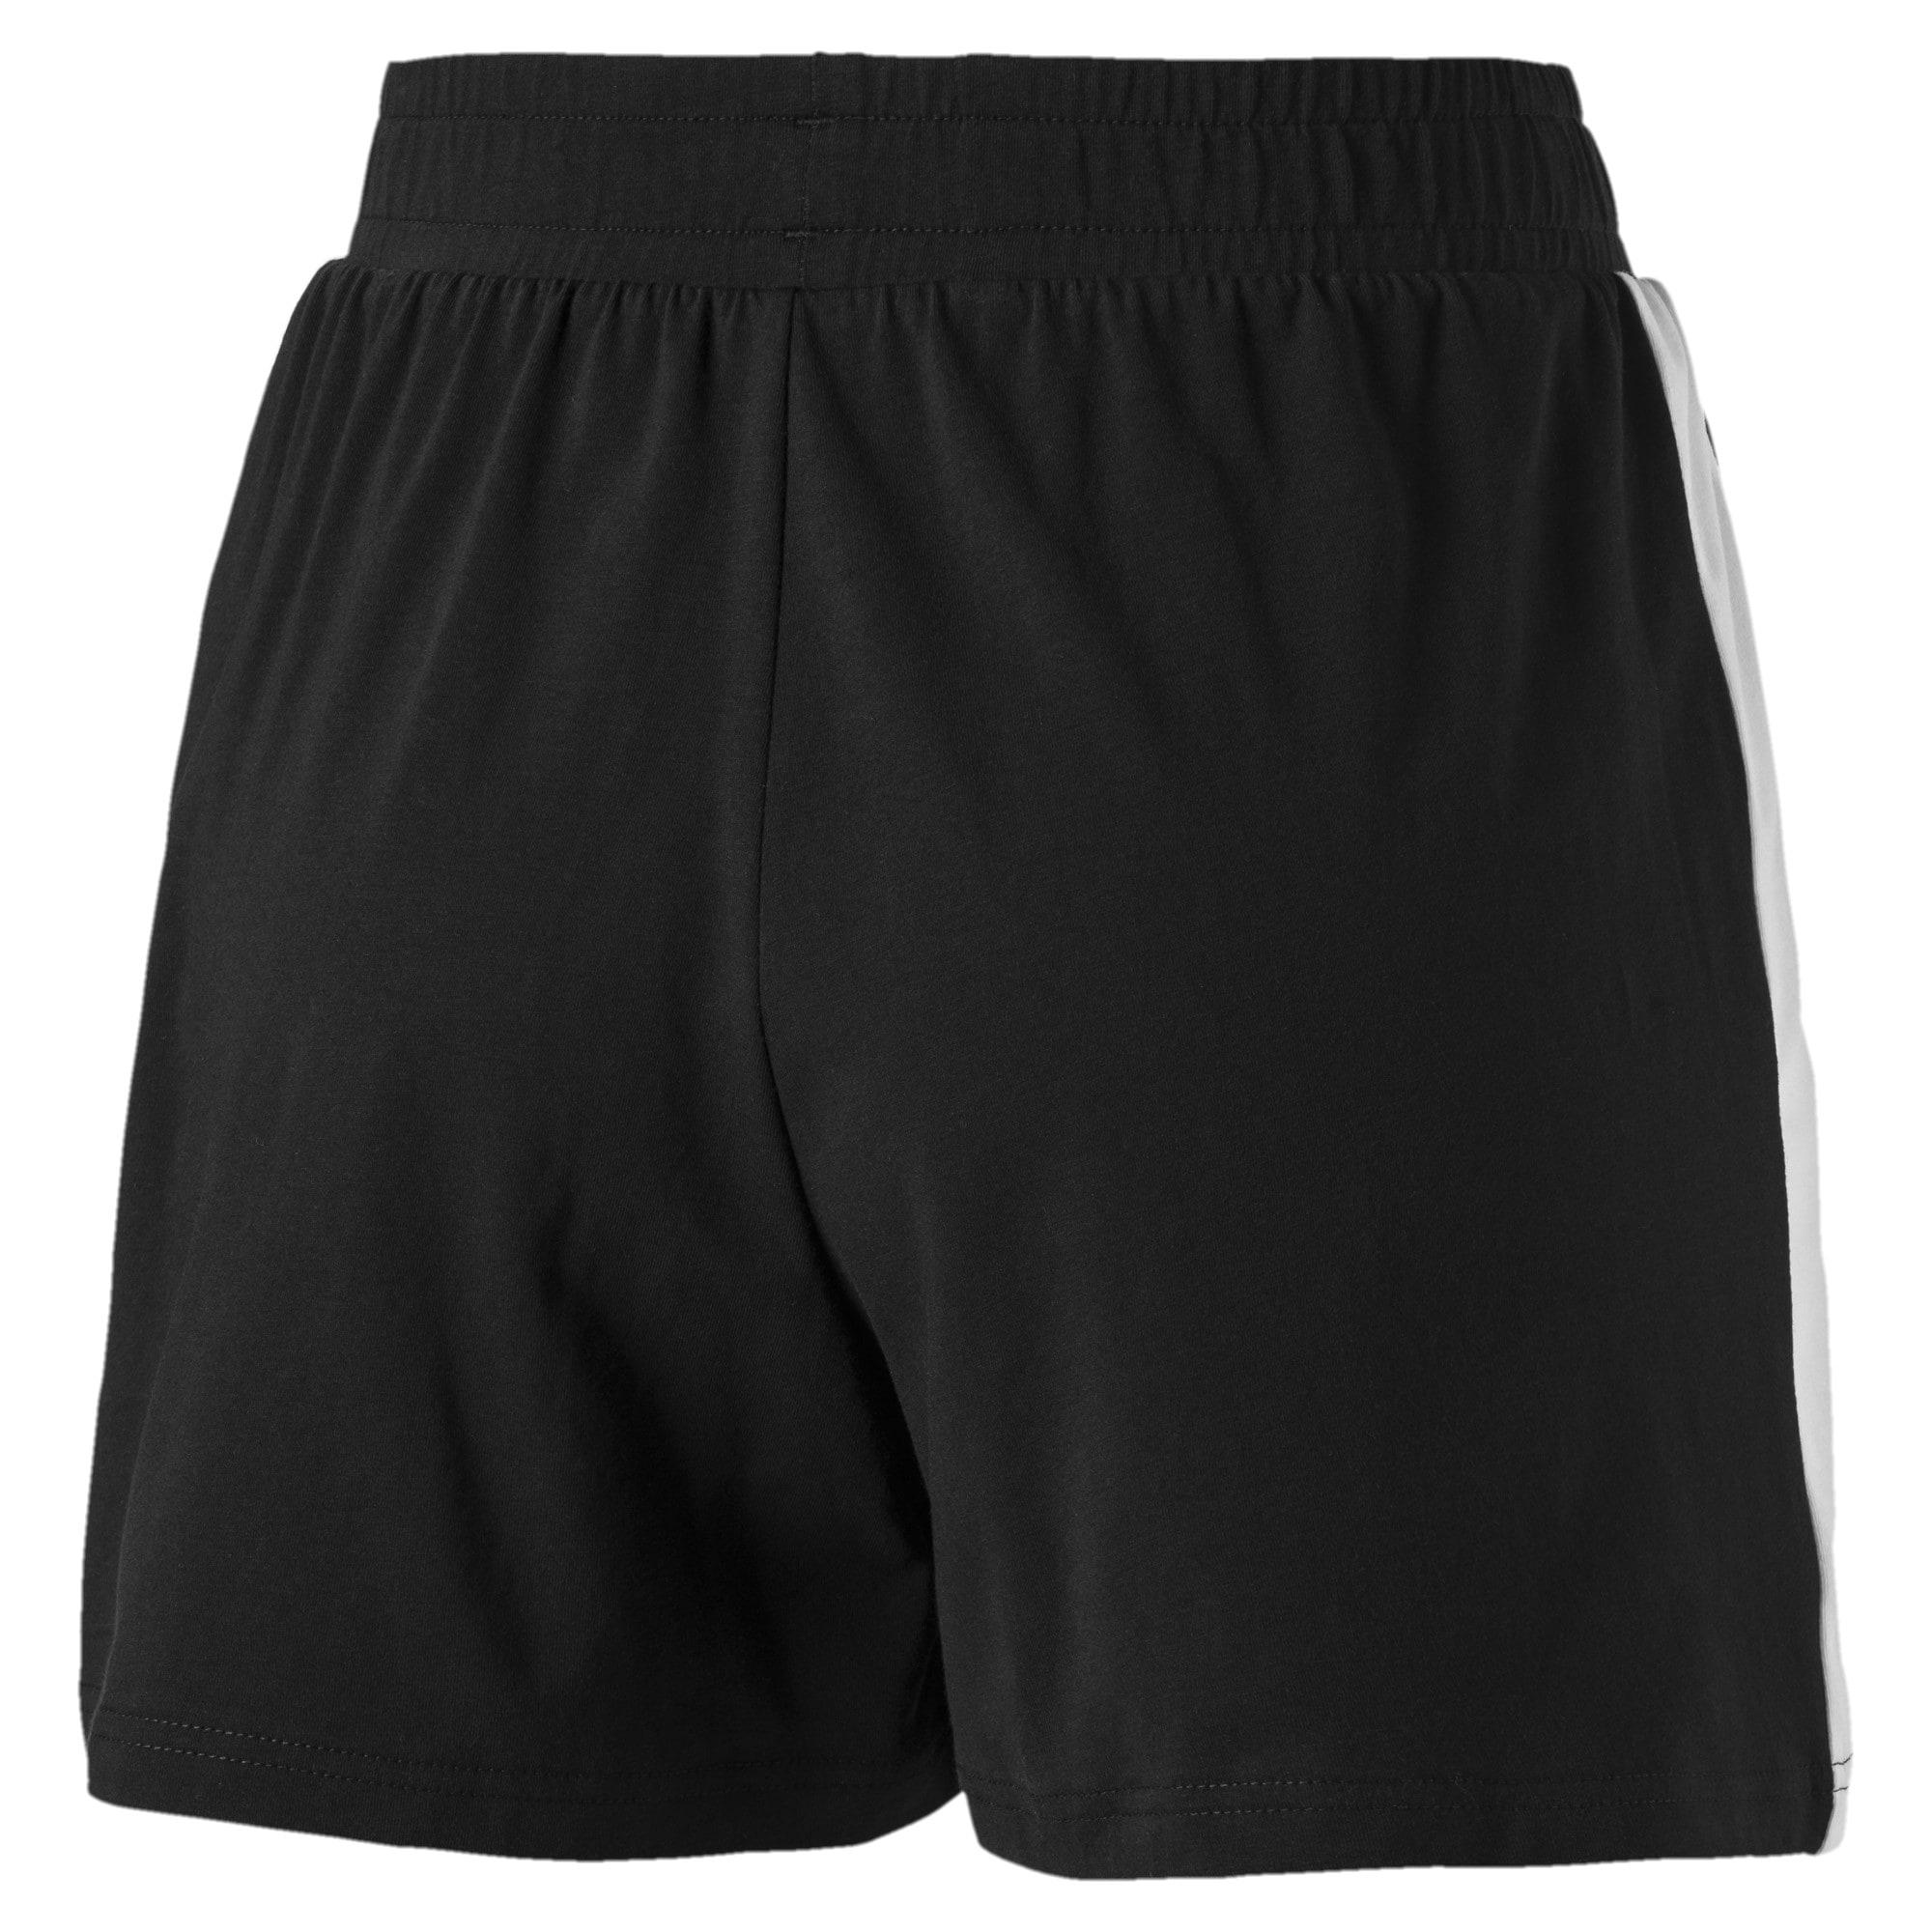 Thumbnail 4 of Classics T7 Knitted Women's Shorts, Cotton Black, medium